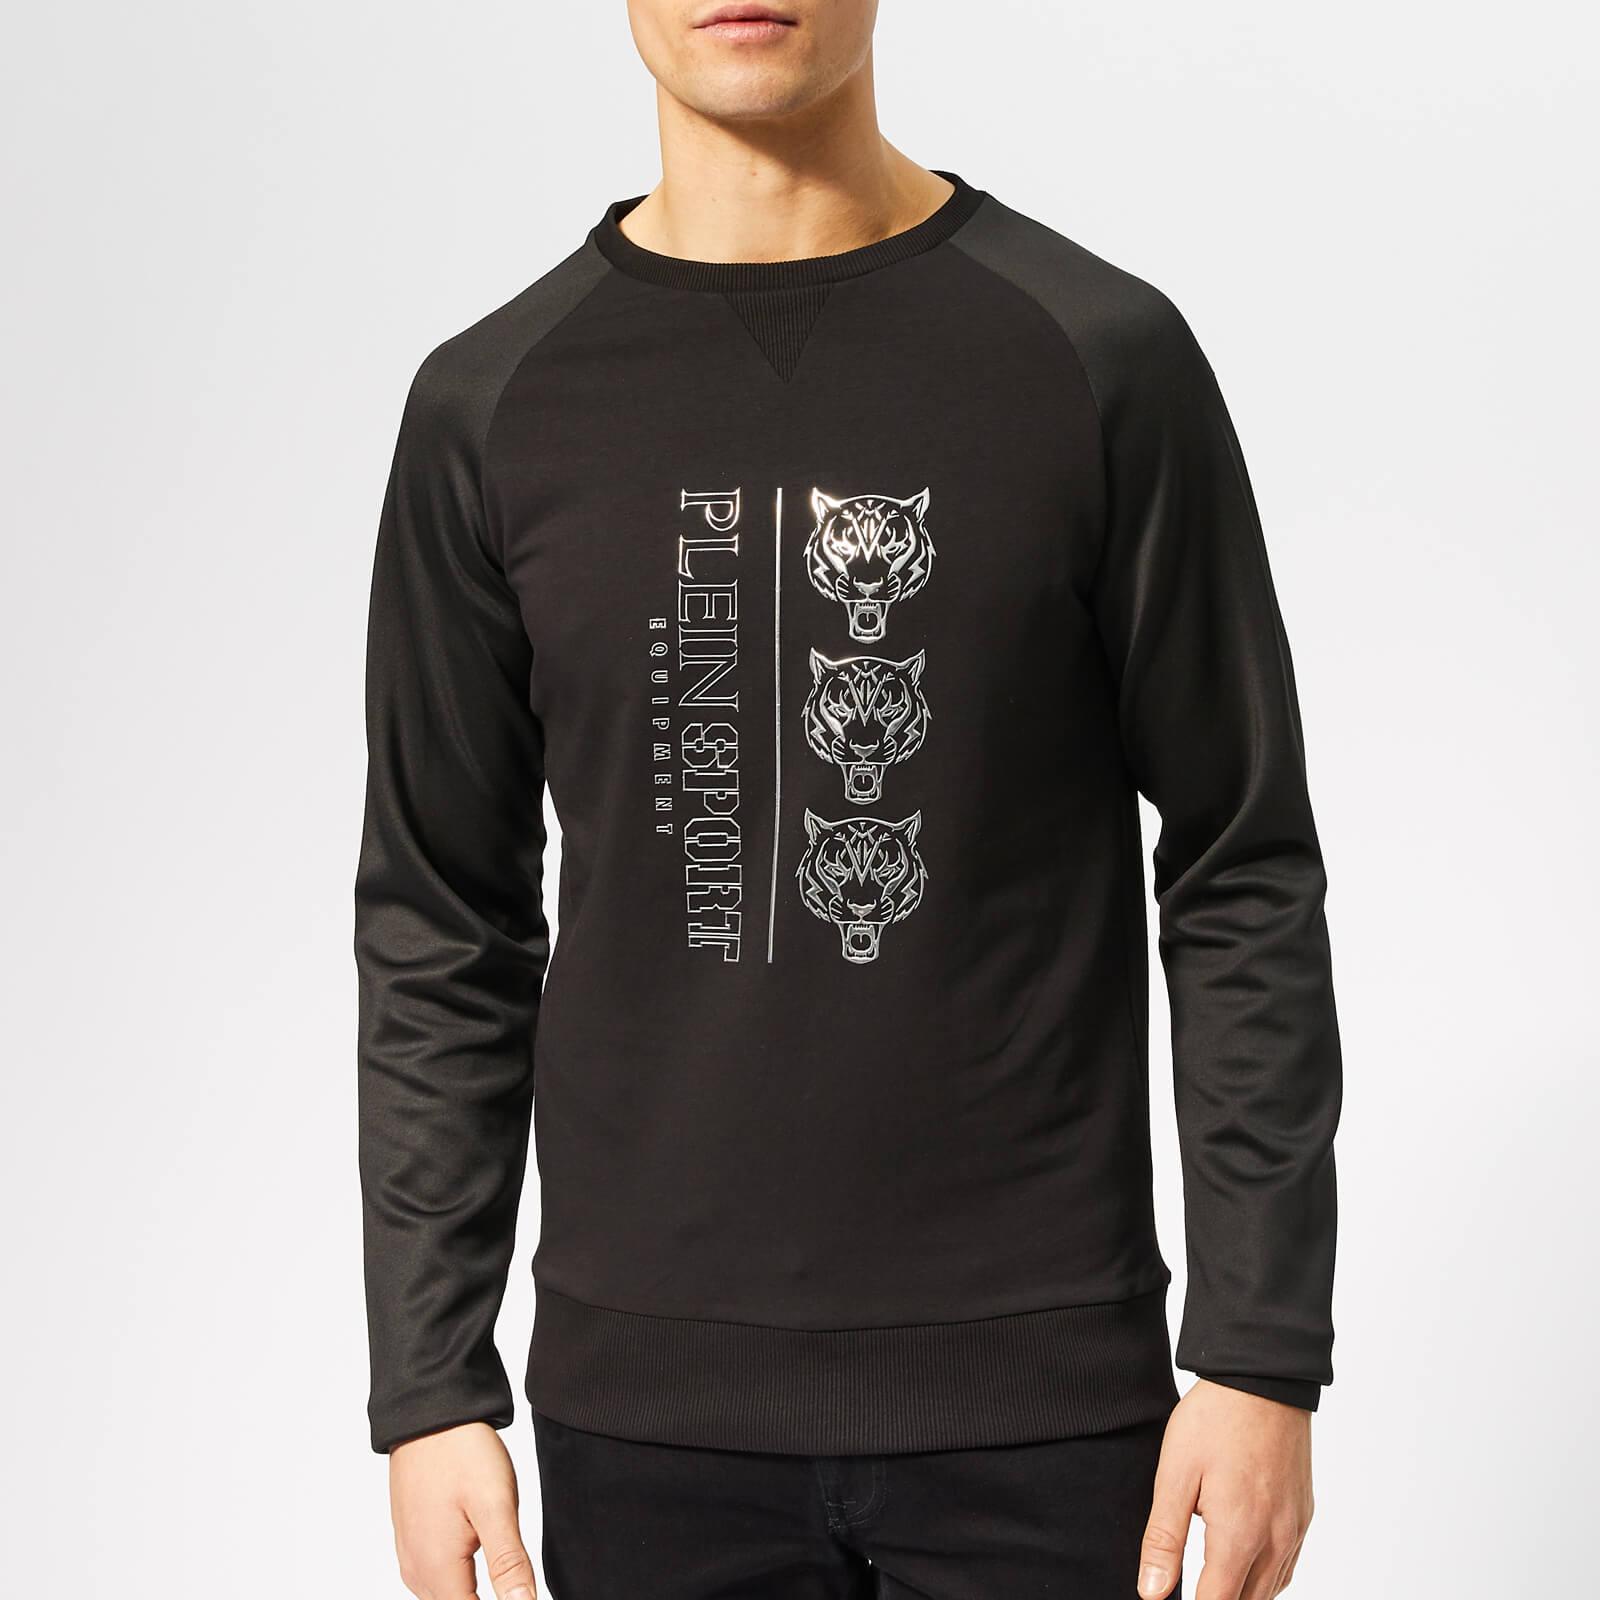 Plein Sport Men's Sweatshirt Long Sleeve Tiger - Black/Silver - XXL - Black/Silver